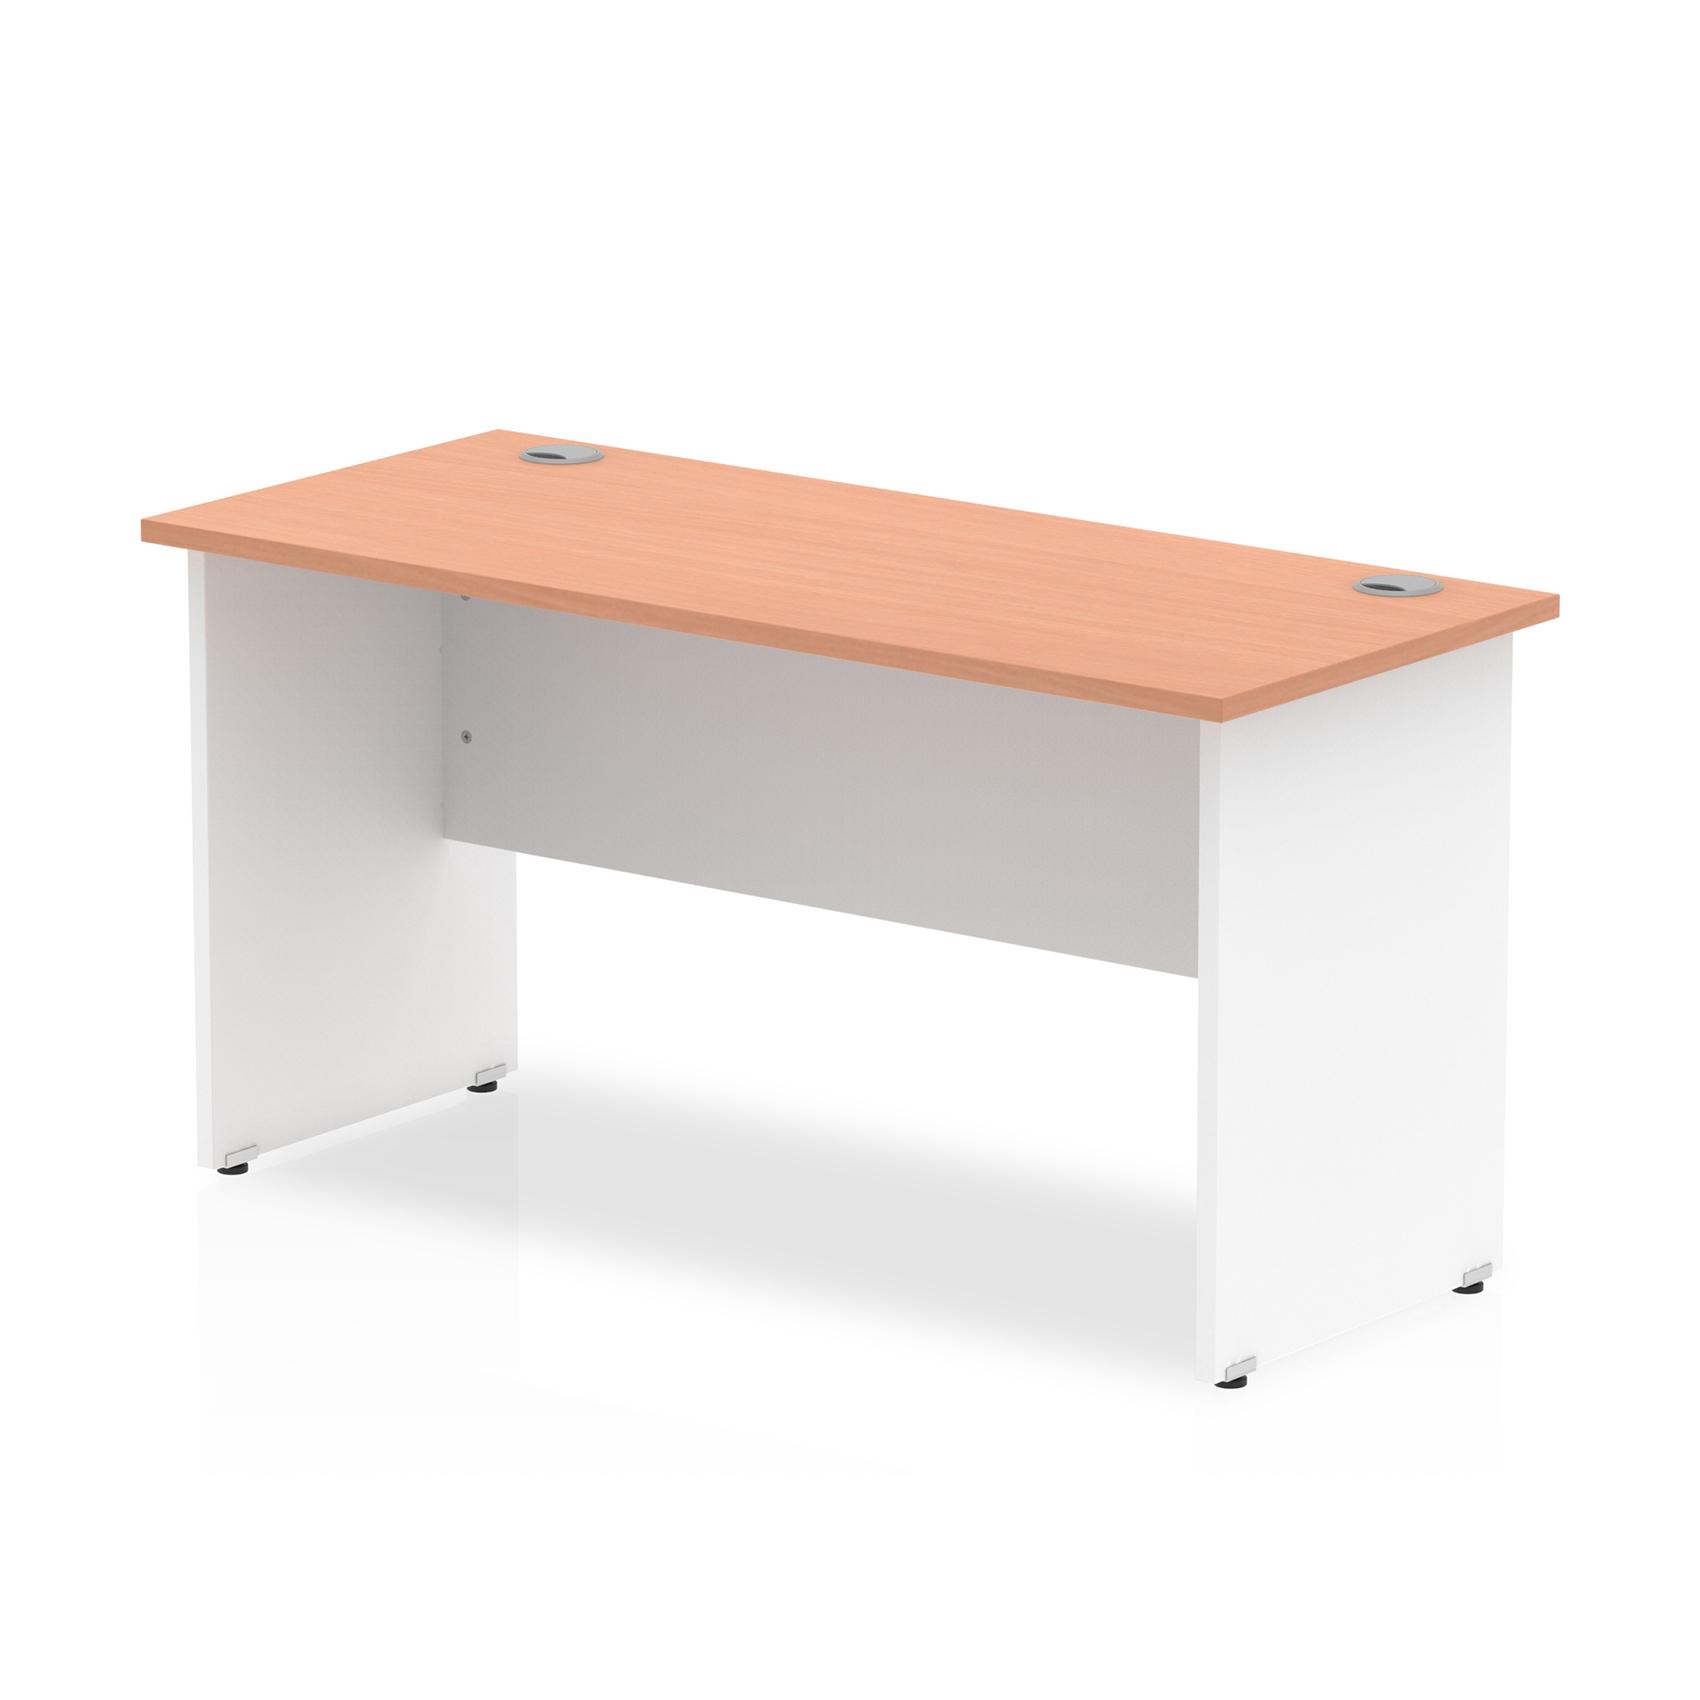 Trexus Desk Rectangle Panel End 1400x600mm Beech Top White Panels Ref TT000093